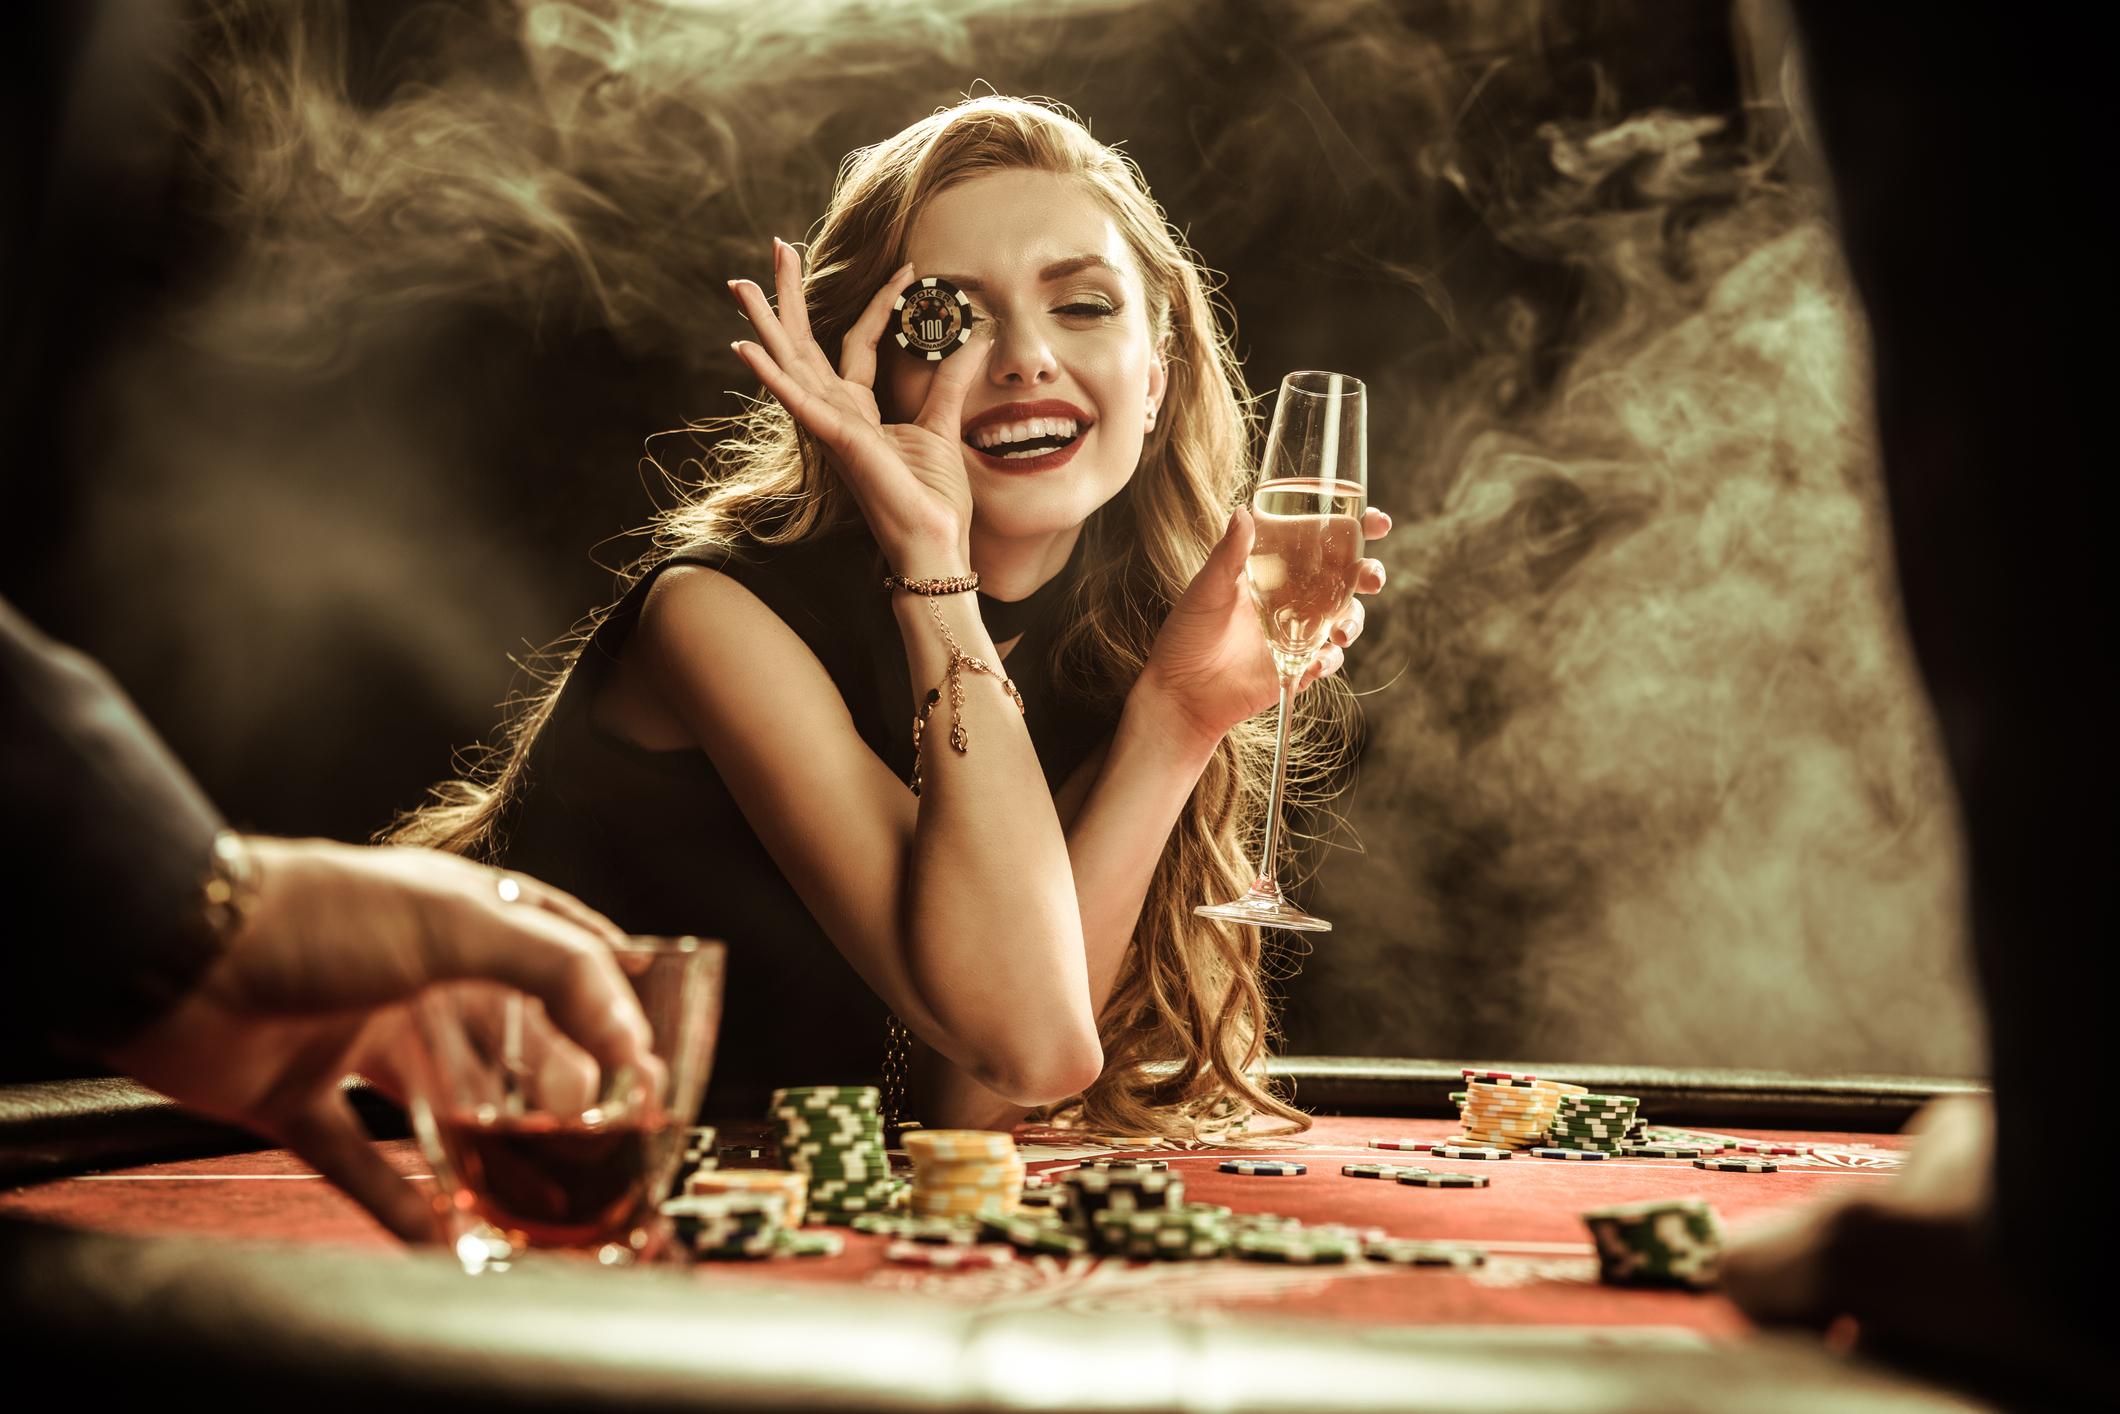 pezsgo_casino_szoke_no_istock.jpg